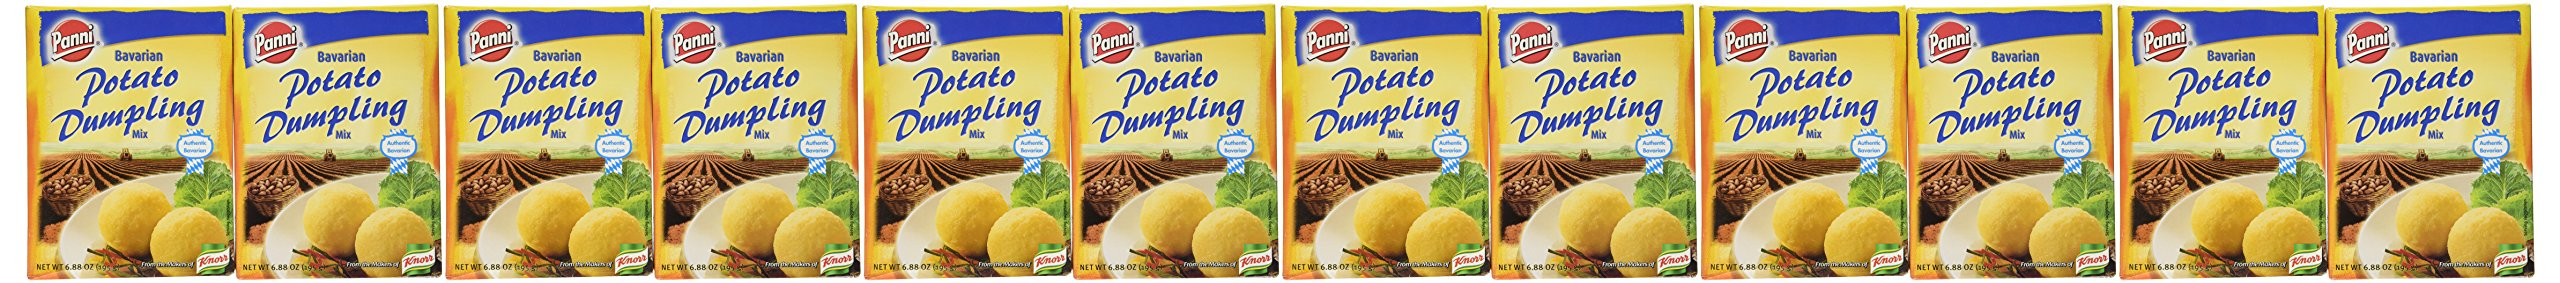 Panni Bavarian Potato Dumpling, 6.88 Ounce (Pack of 12) by Panni